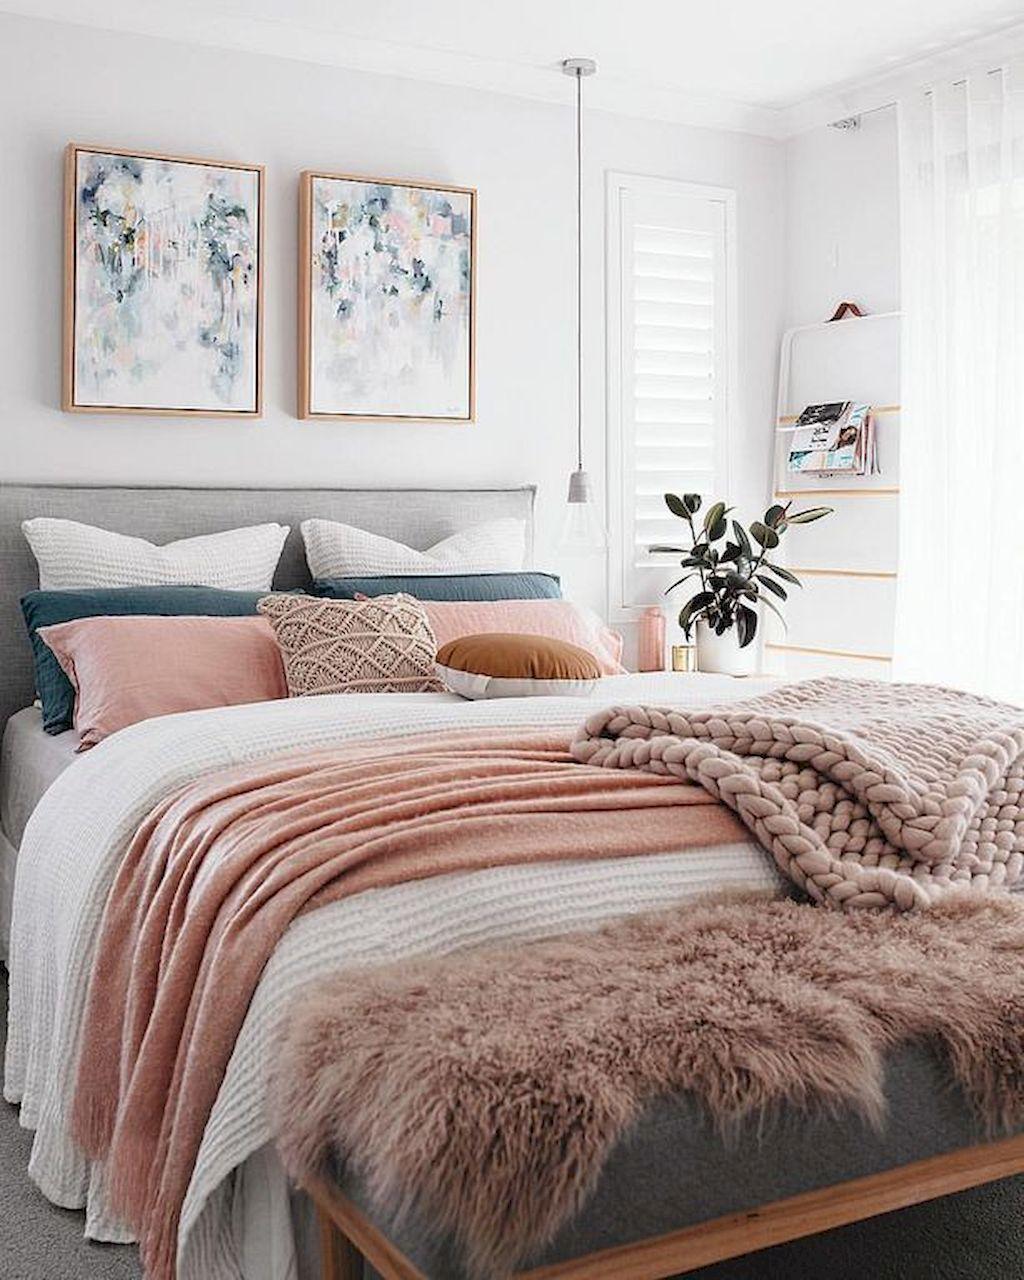 40 Small Bedrooms Ideas: 40 Best Apartment Bedroom Design Ideas